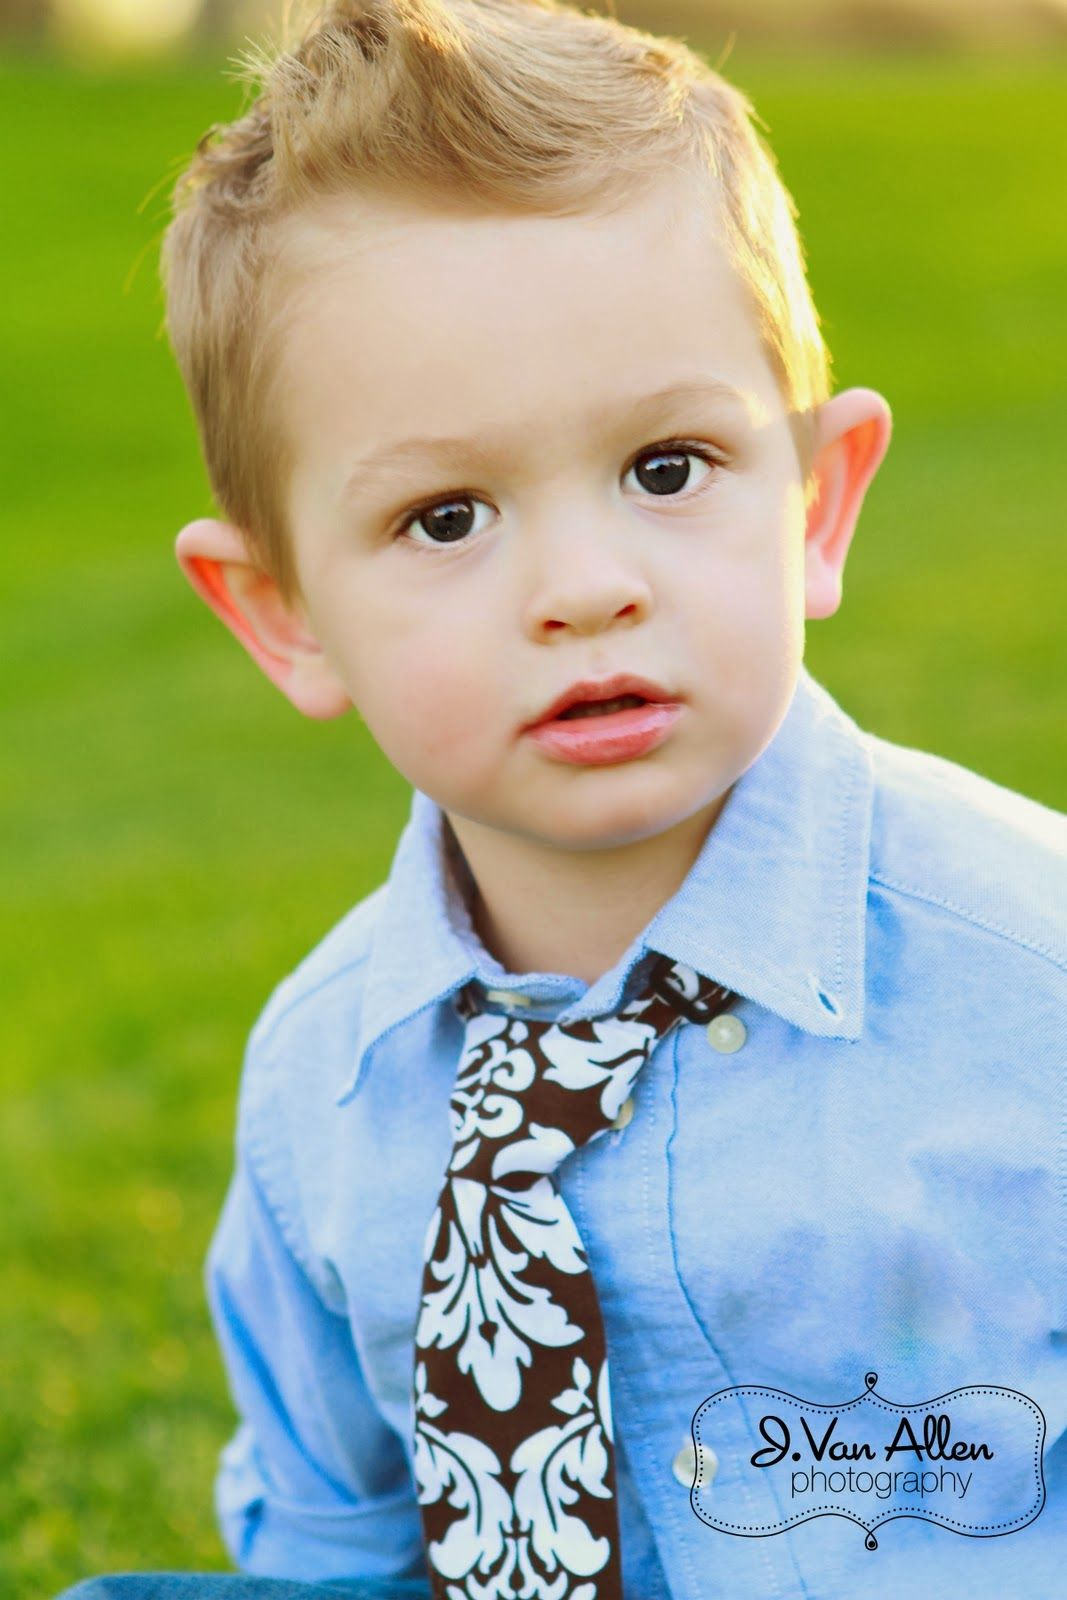 Cute boy hd wallpaper - Cute Boy Wallpaper Cute Boy Fhdq Images Free Download Pack V